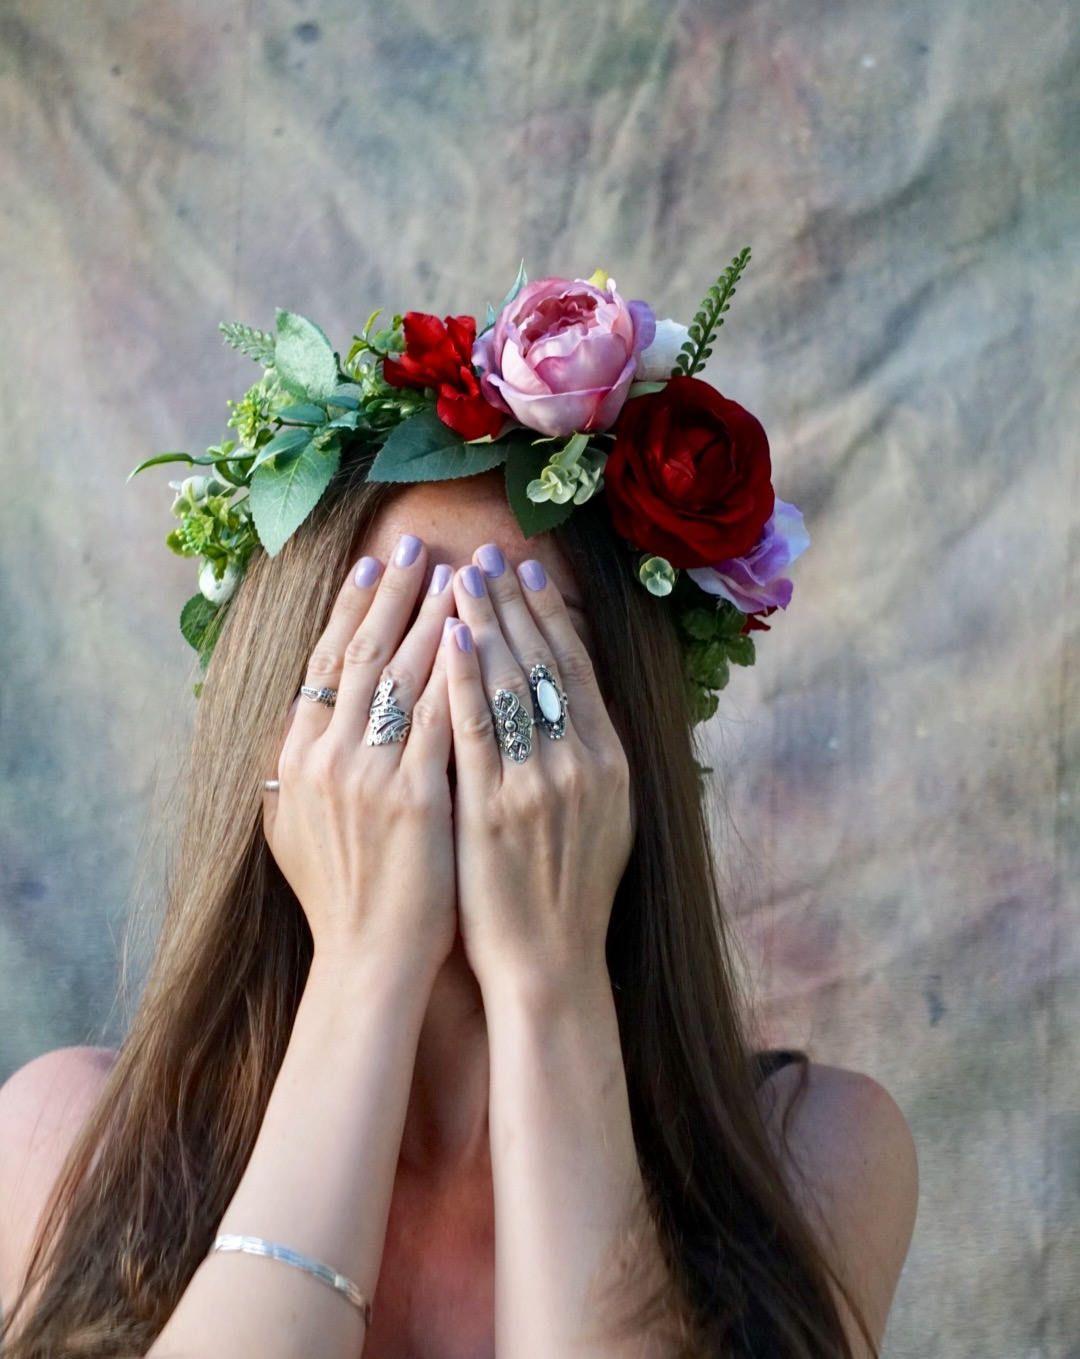 Flower crown wedding red pink flower crown greenery crown flower flower crown wedding red pink flower crown greenery crown flower crown adult bridal headpiece lavender floral crown by welcominggracecrafts on etsy izmirmasajfo